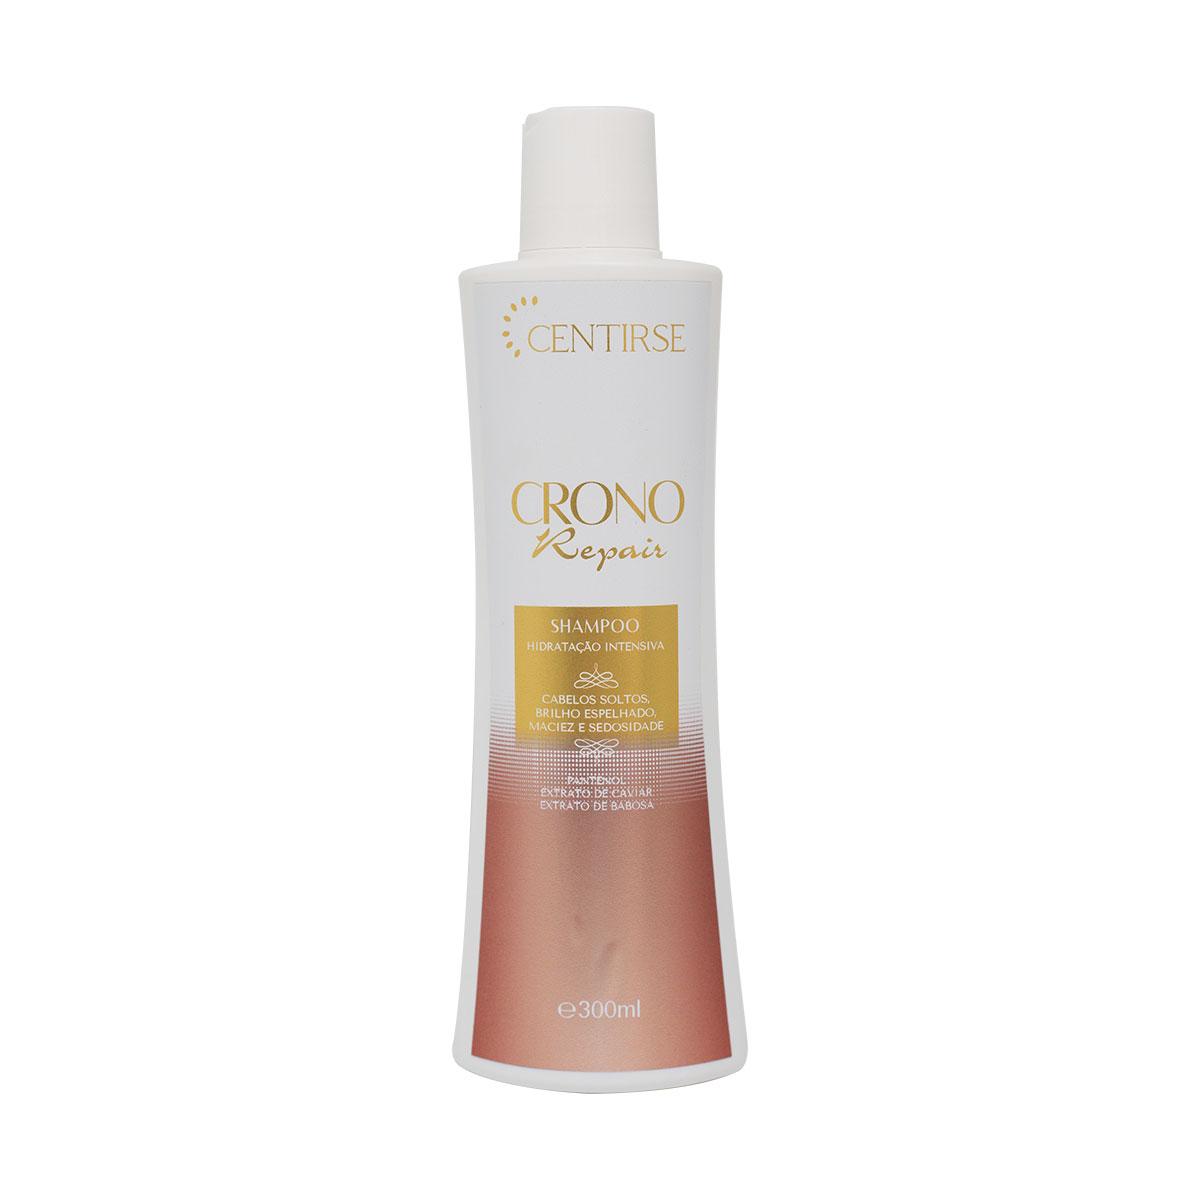 Shampoo para Cabelos  Crono Repair Centirse 300ml